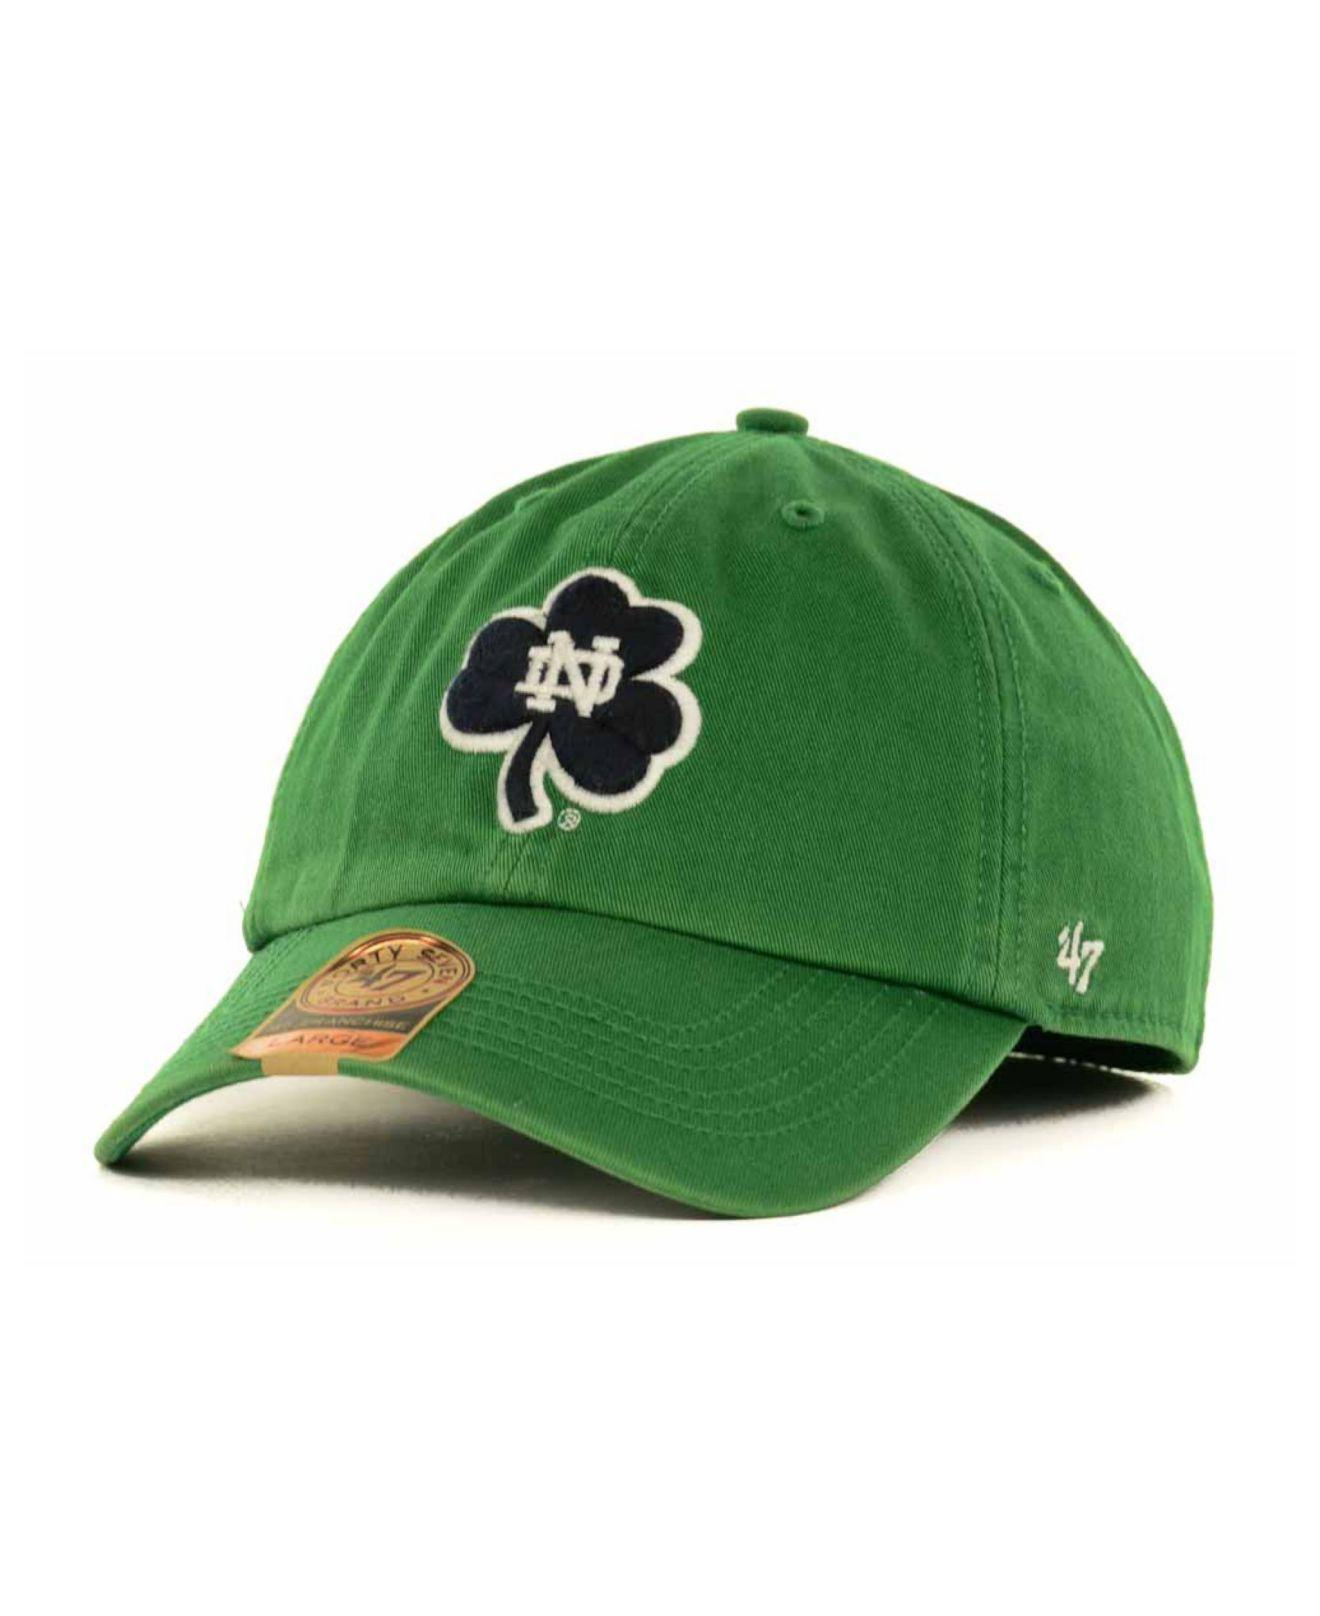 5dd1d1690fb Lyst - 47 Brand Notre Dame Fighting Irish Franchise Cap in Blue for Men